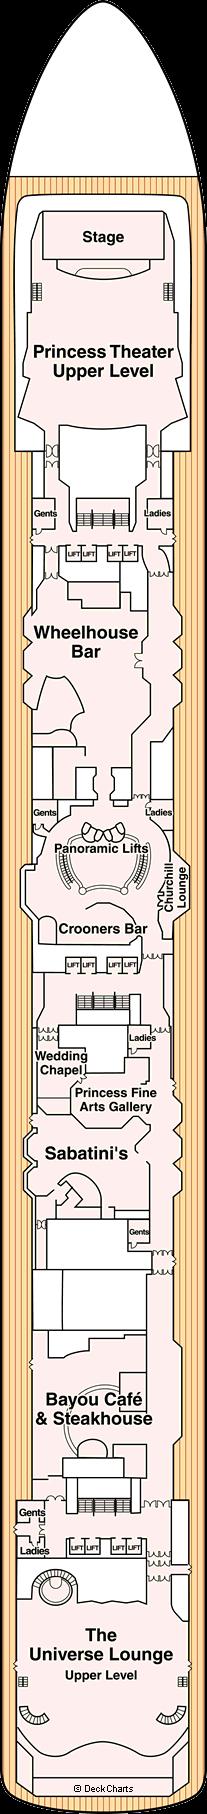 Coral Princess: Promenade Deck